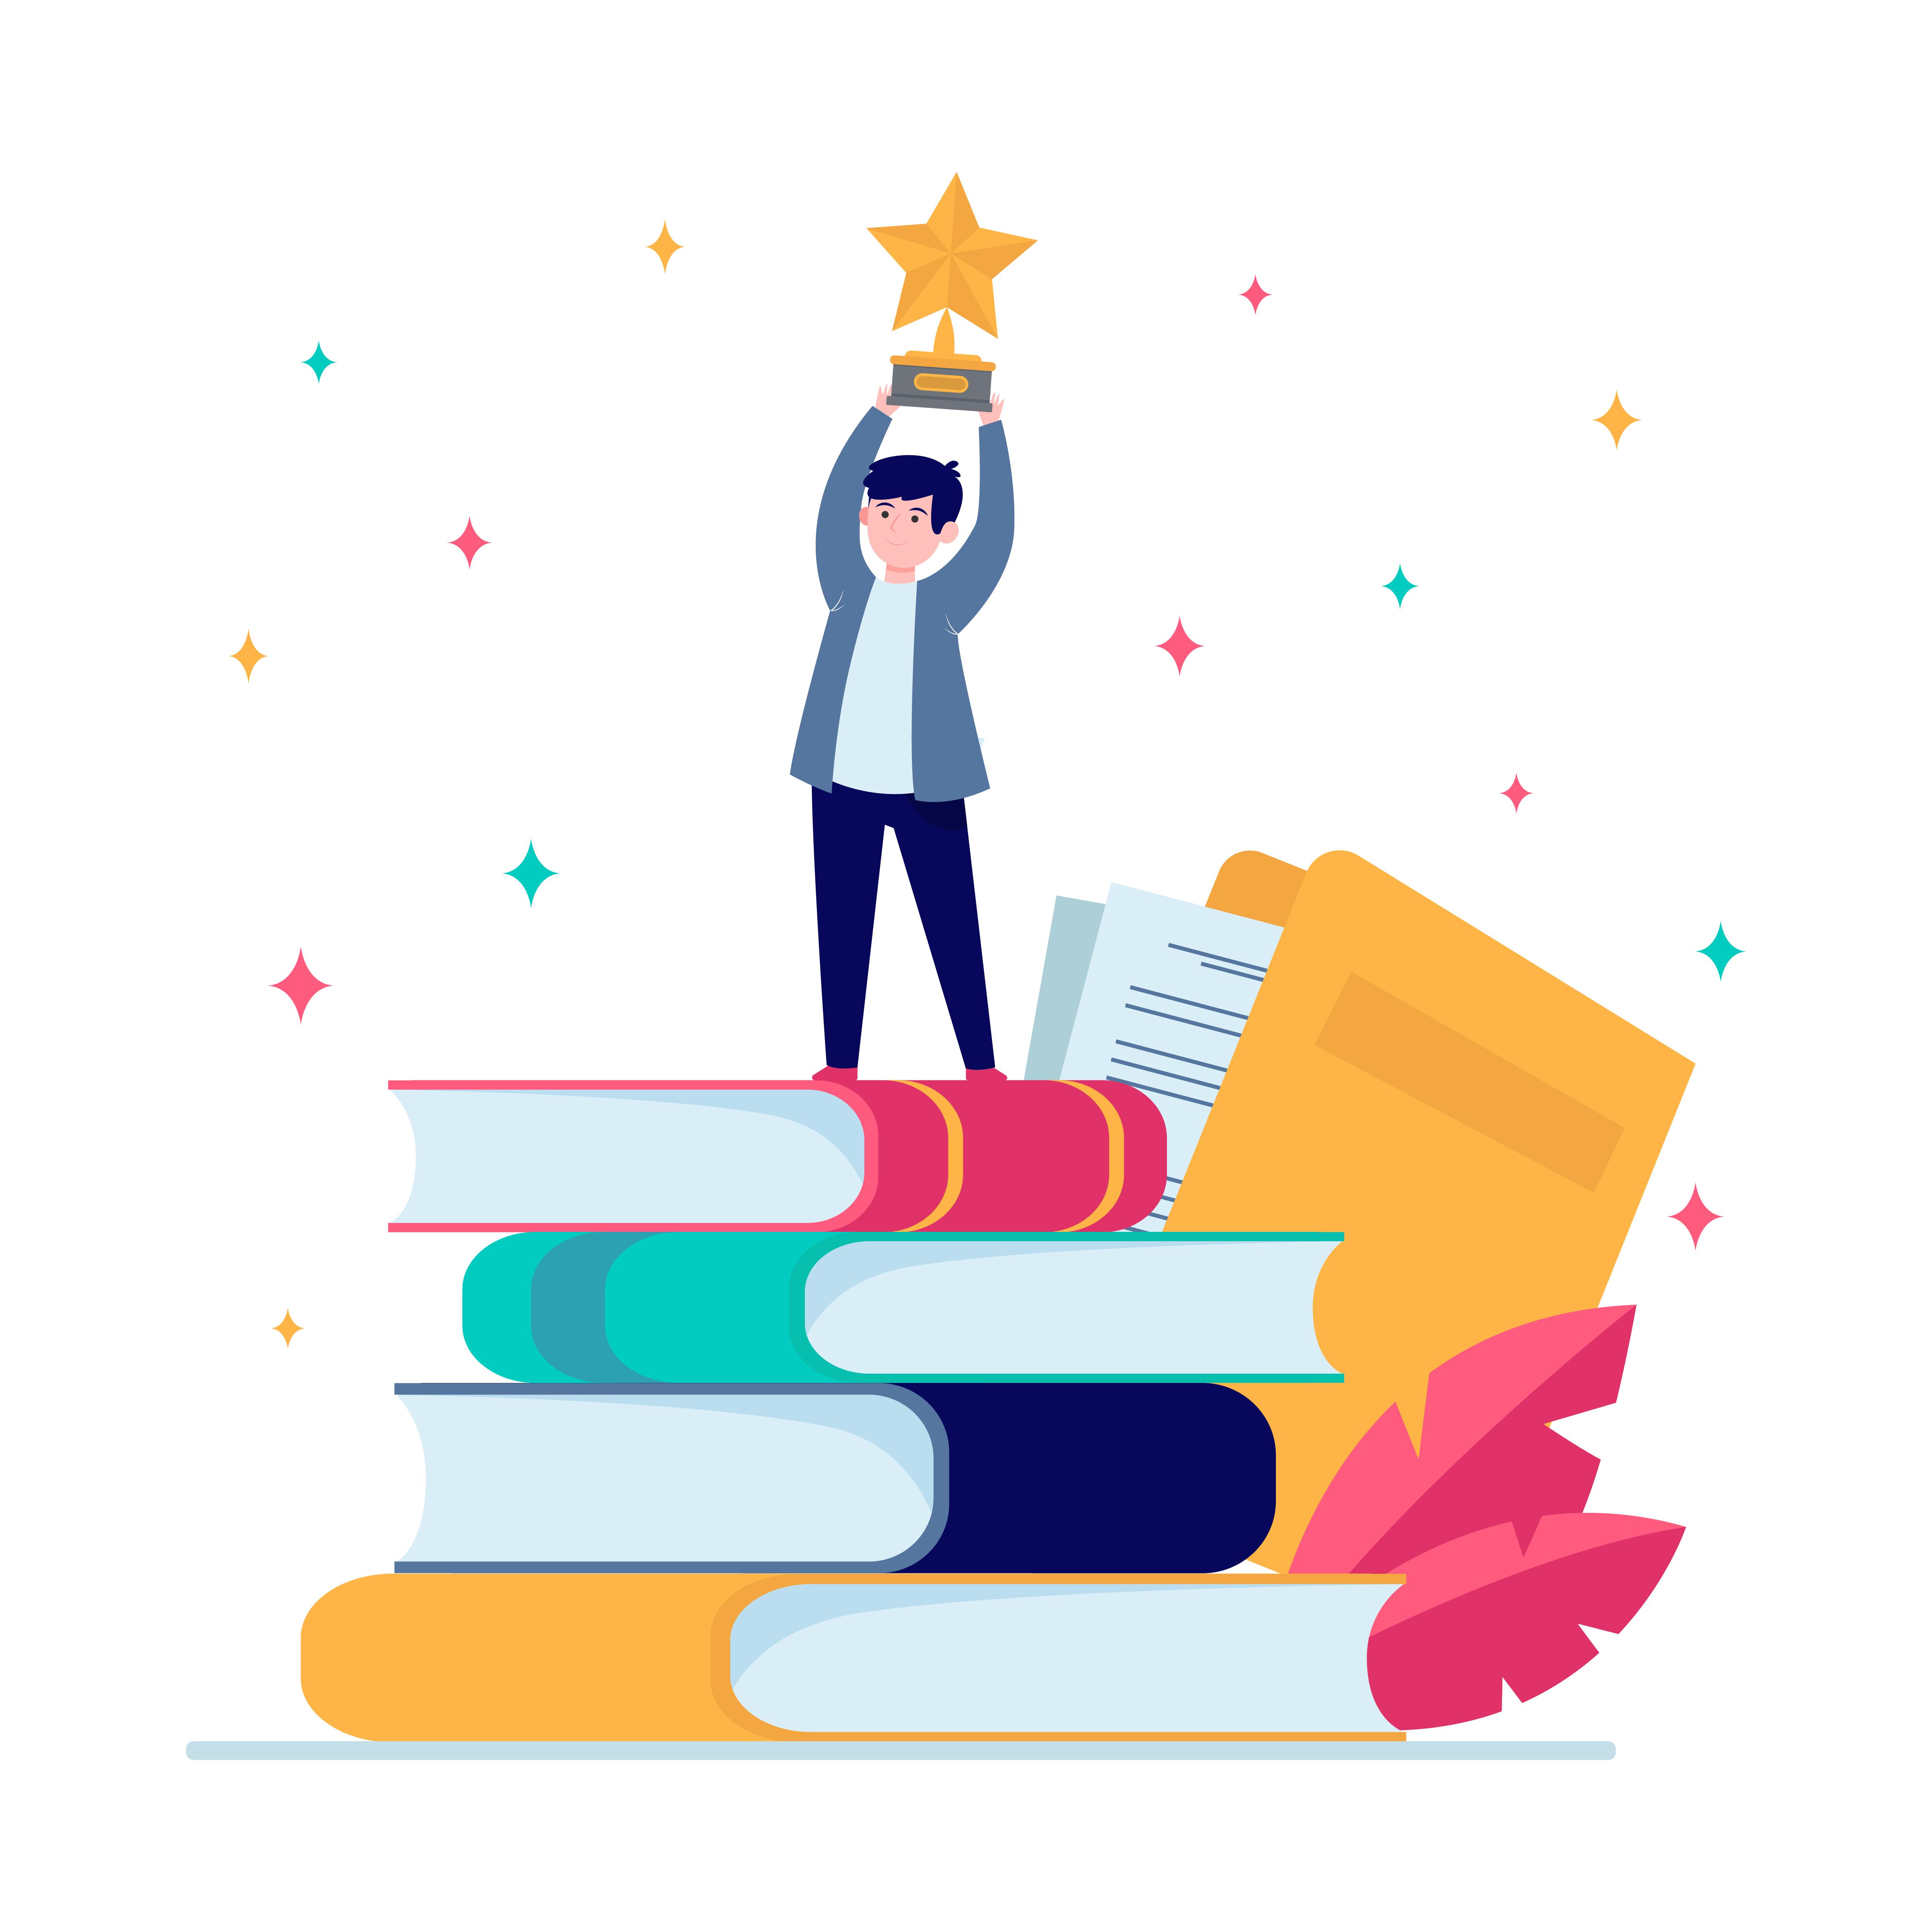 Ingin Jadi Penulis Karya Fiksi Profesional? Pahami Elemen-Elemen Penting Ini